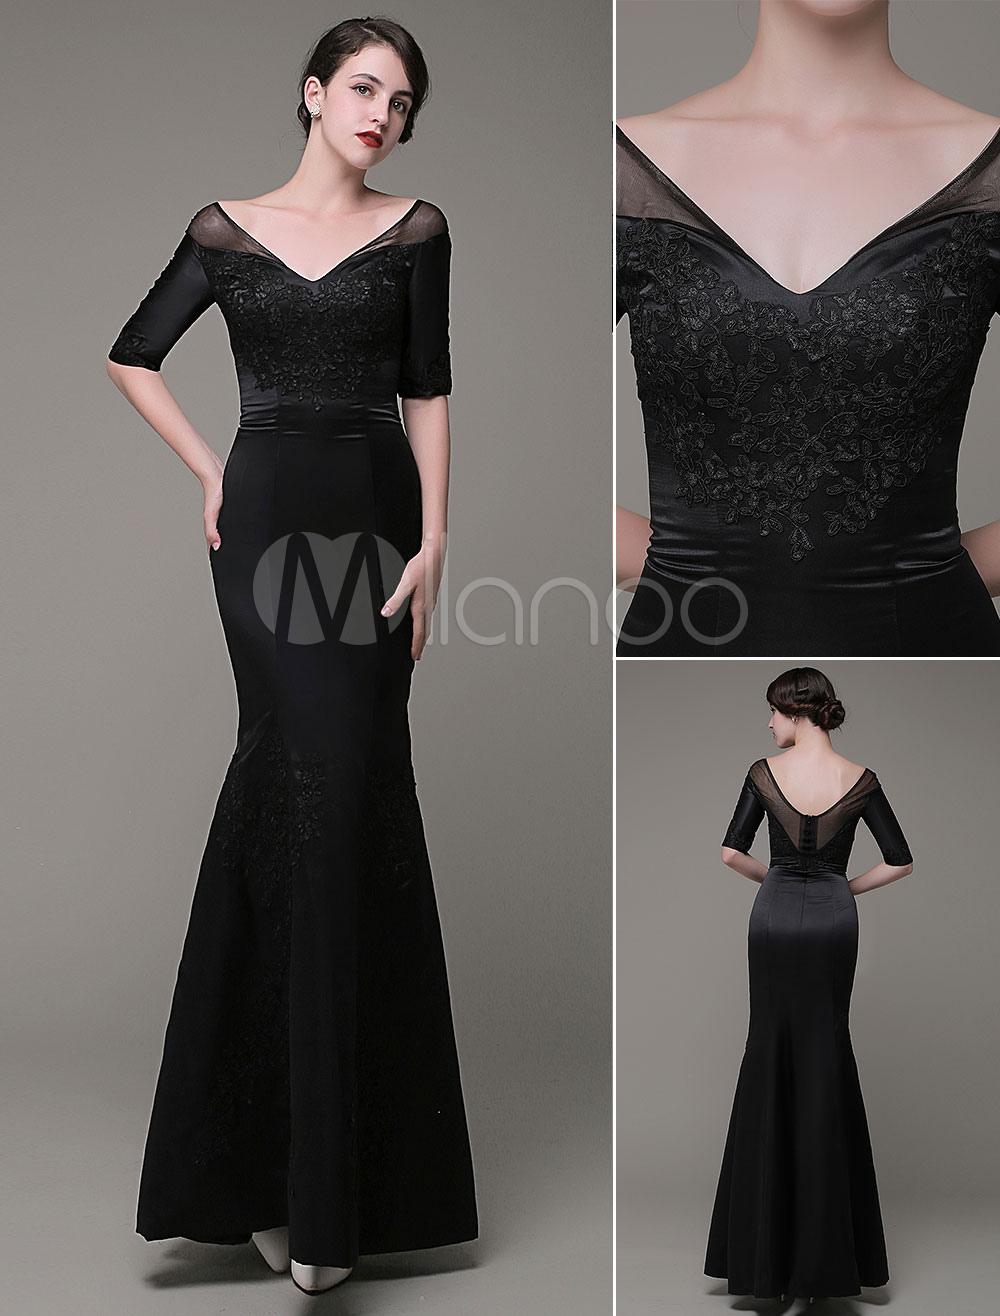 Mother Of The Bride Dresses Illusion V-Neck Lace Applique Floor Length Meimaid Evening Dress Milanoo